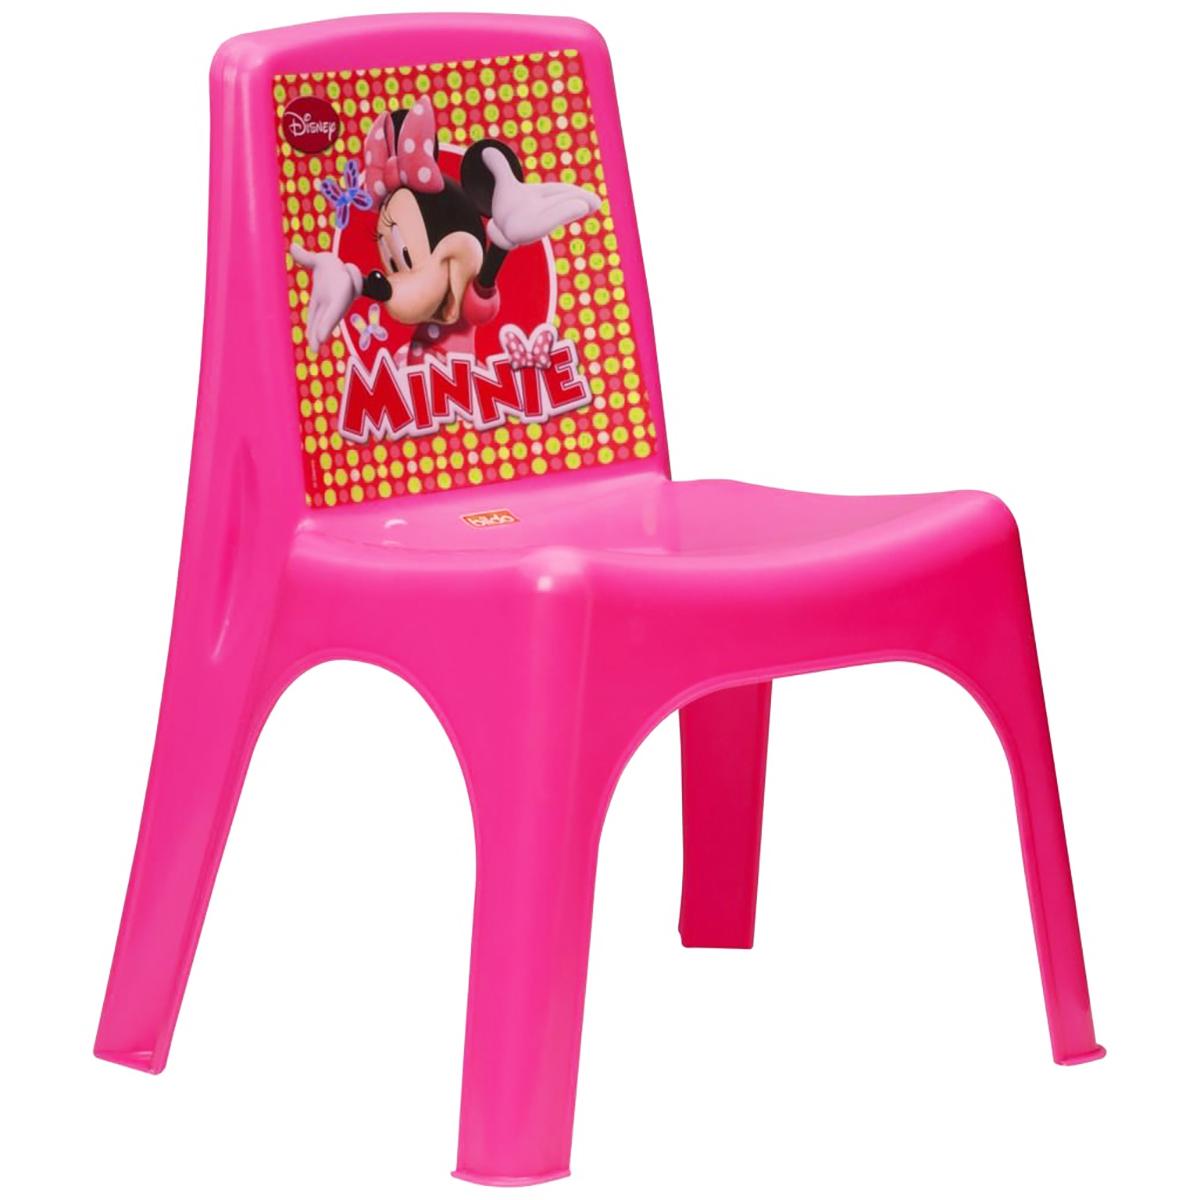 disney preschool chair plastic red blue pink elsa anna